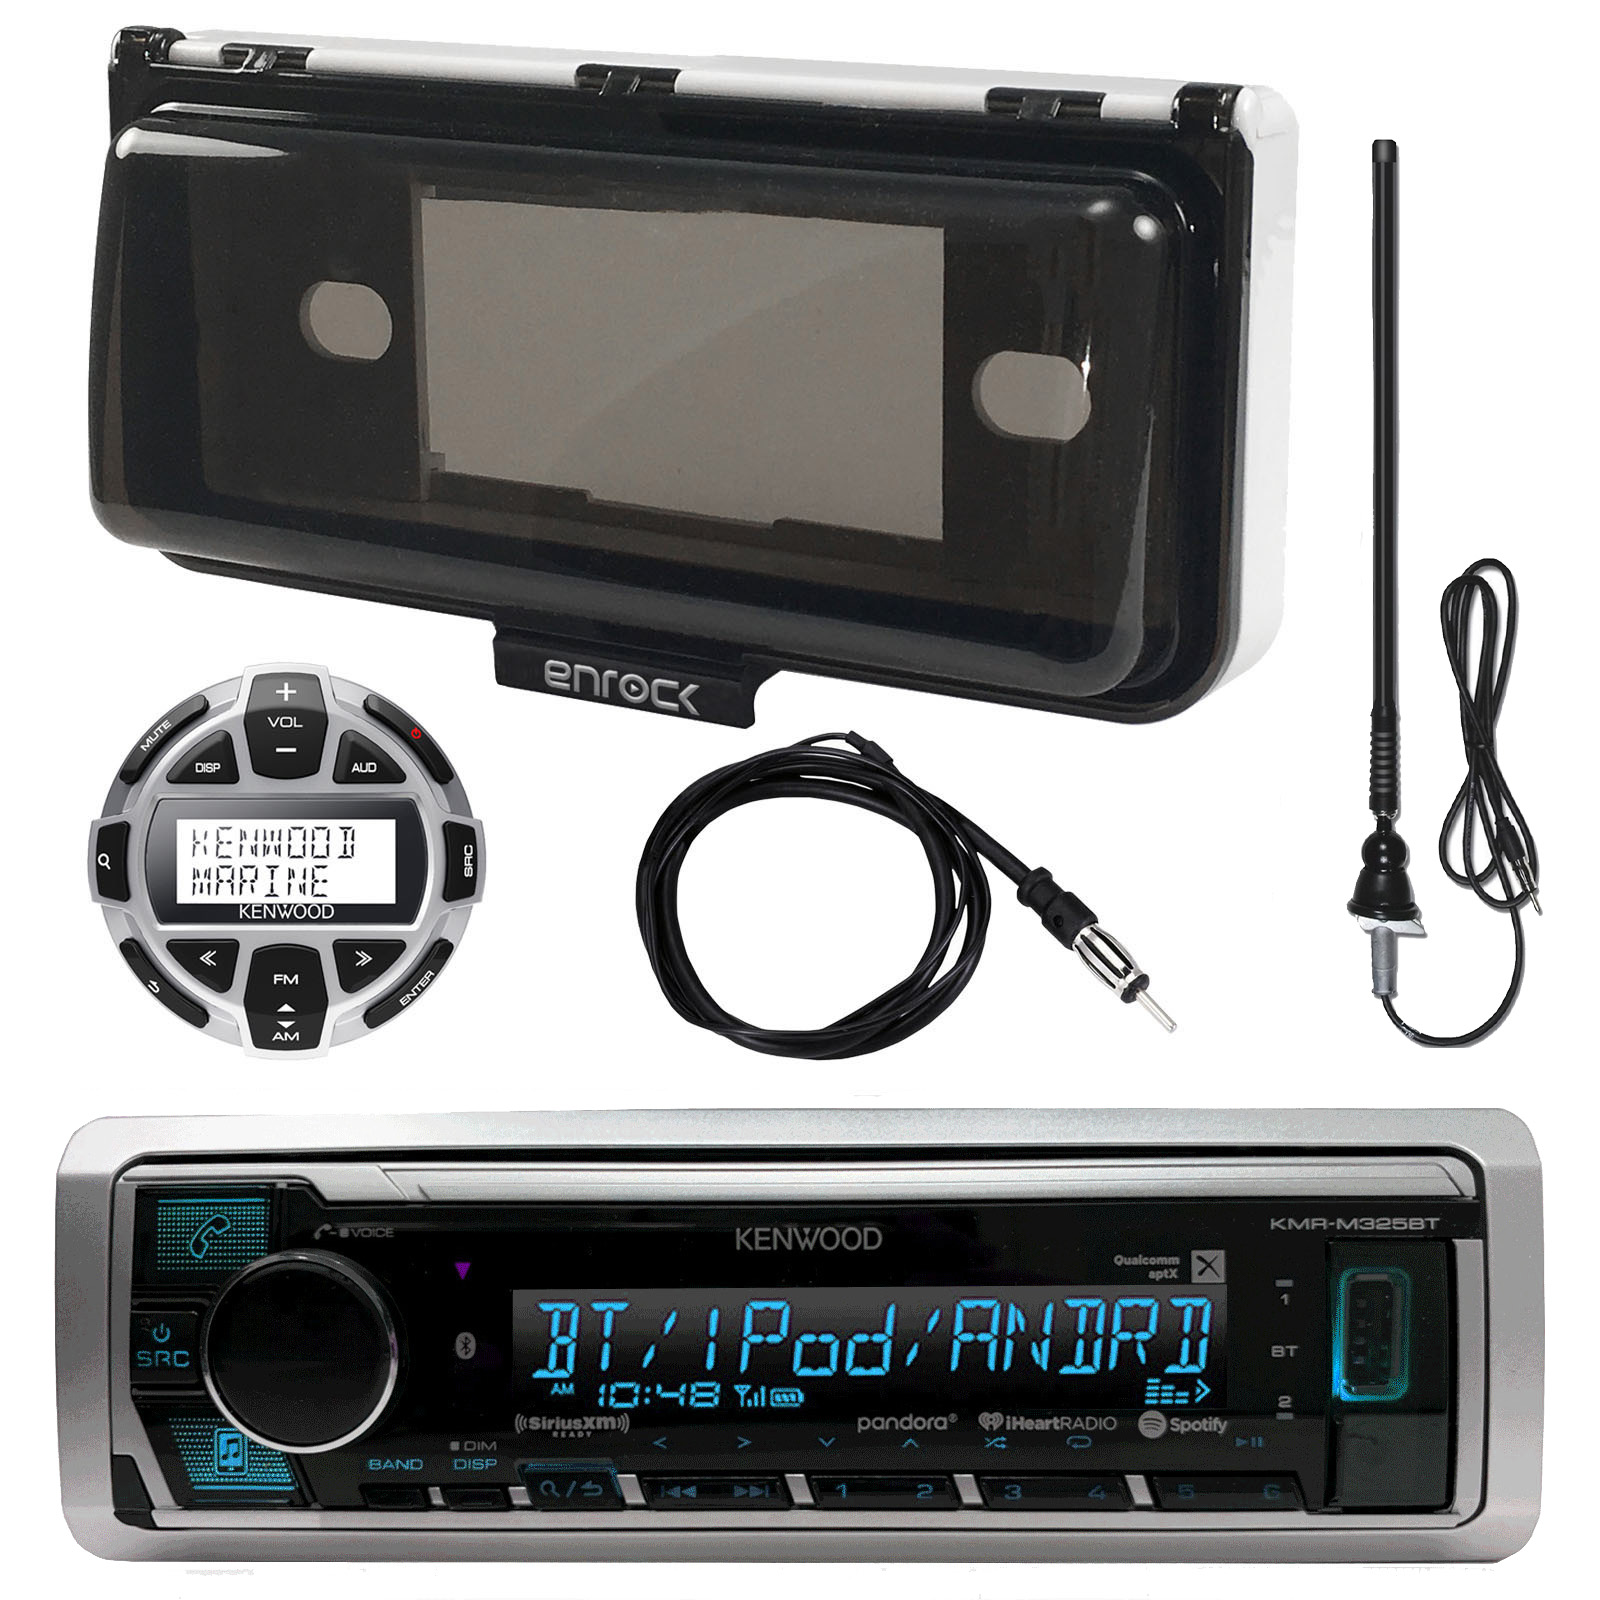 "Kenwood Marine Digital Media Bluetooth Receiver, Enrock Marine Single Din Radio Dash Protector (Black), Enrock AM/FM Antenna (Black), Wired Remote, Antenna - 40 """